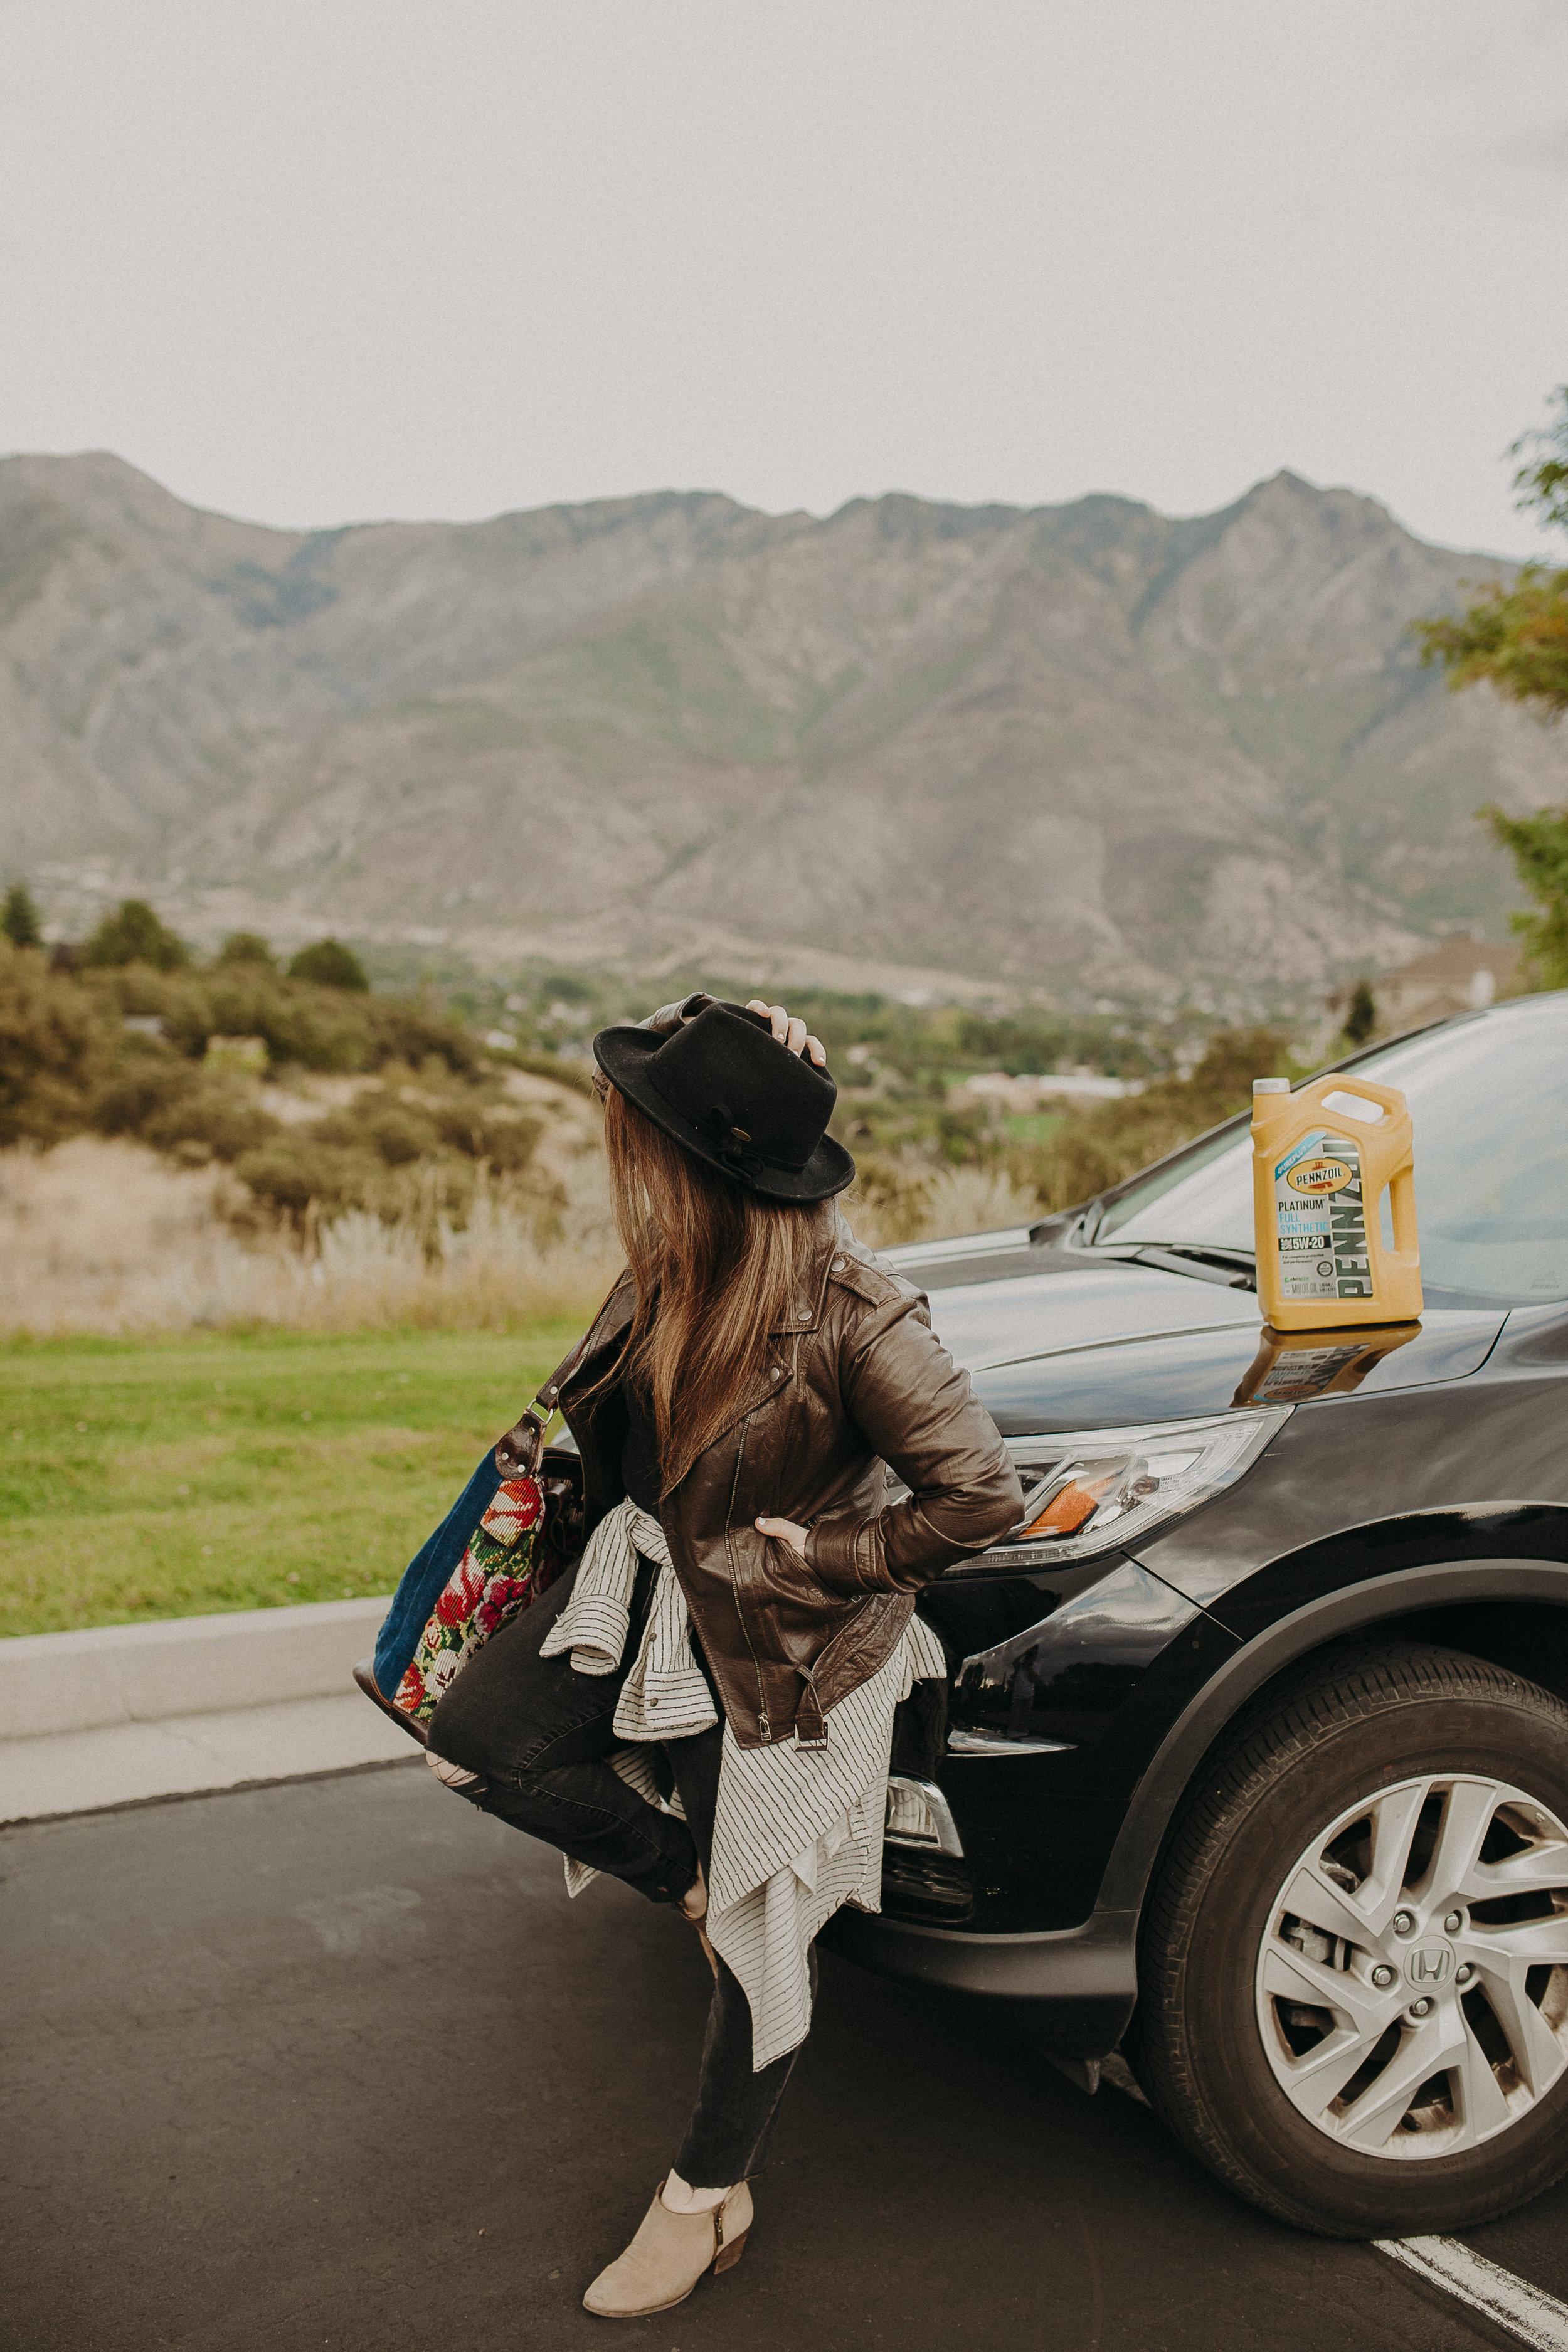 road-trip-outfit-ideas-5.jpg